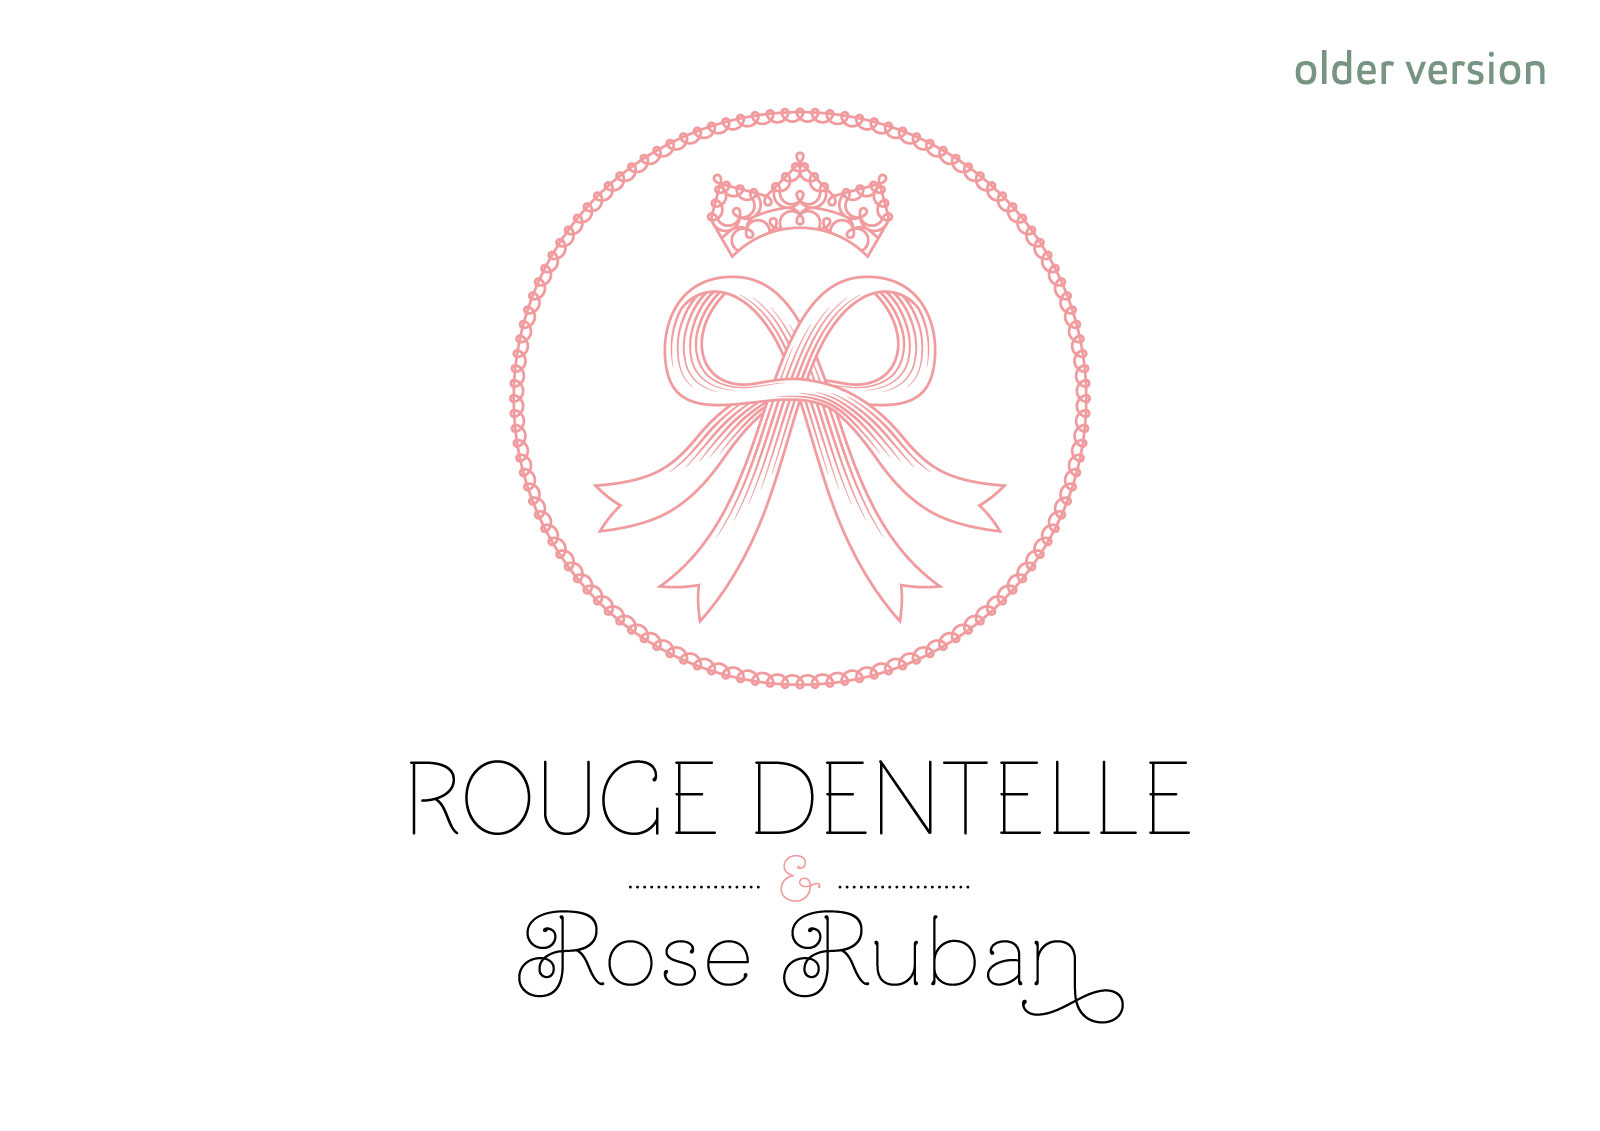 Older version of the logo of french lolita association